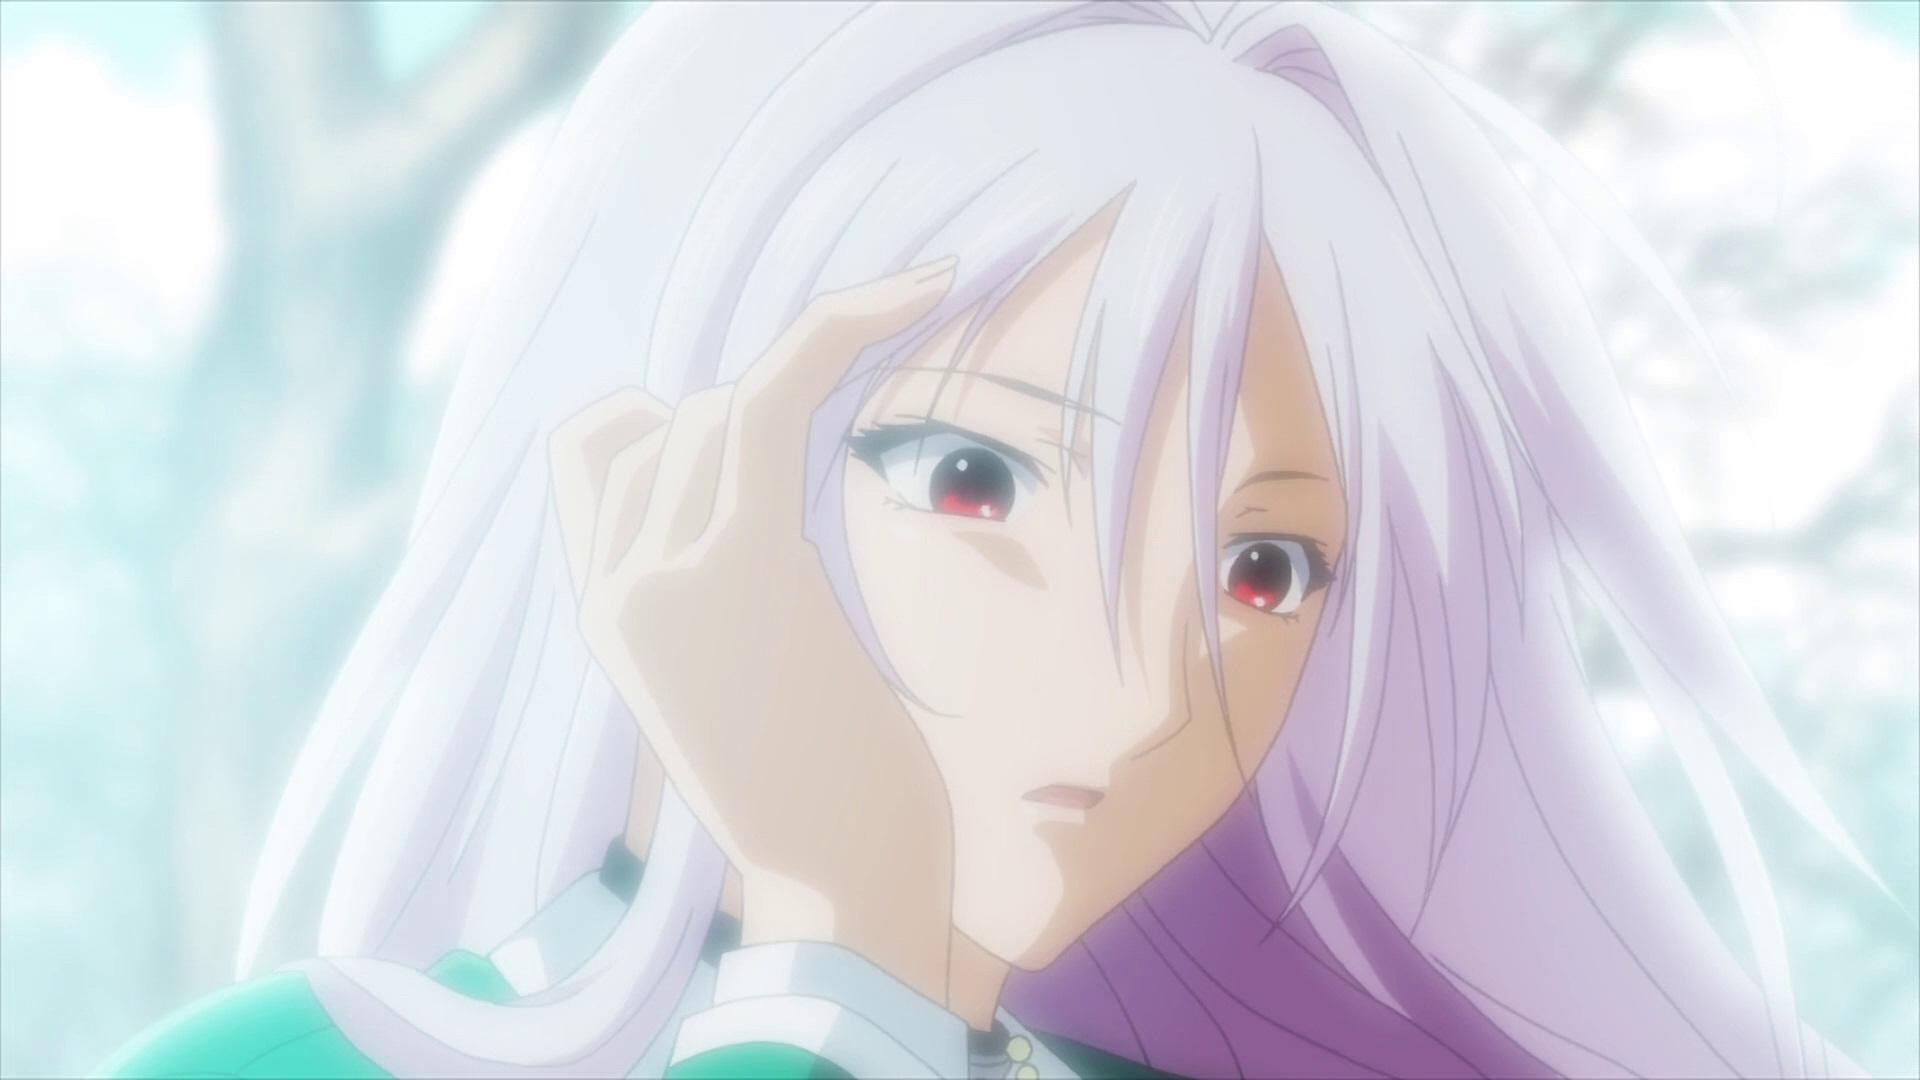 Akashiya Moka (Vampire) - Zerochan Anime Image Board